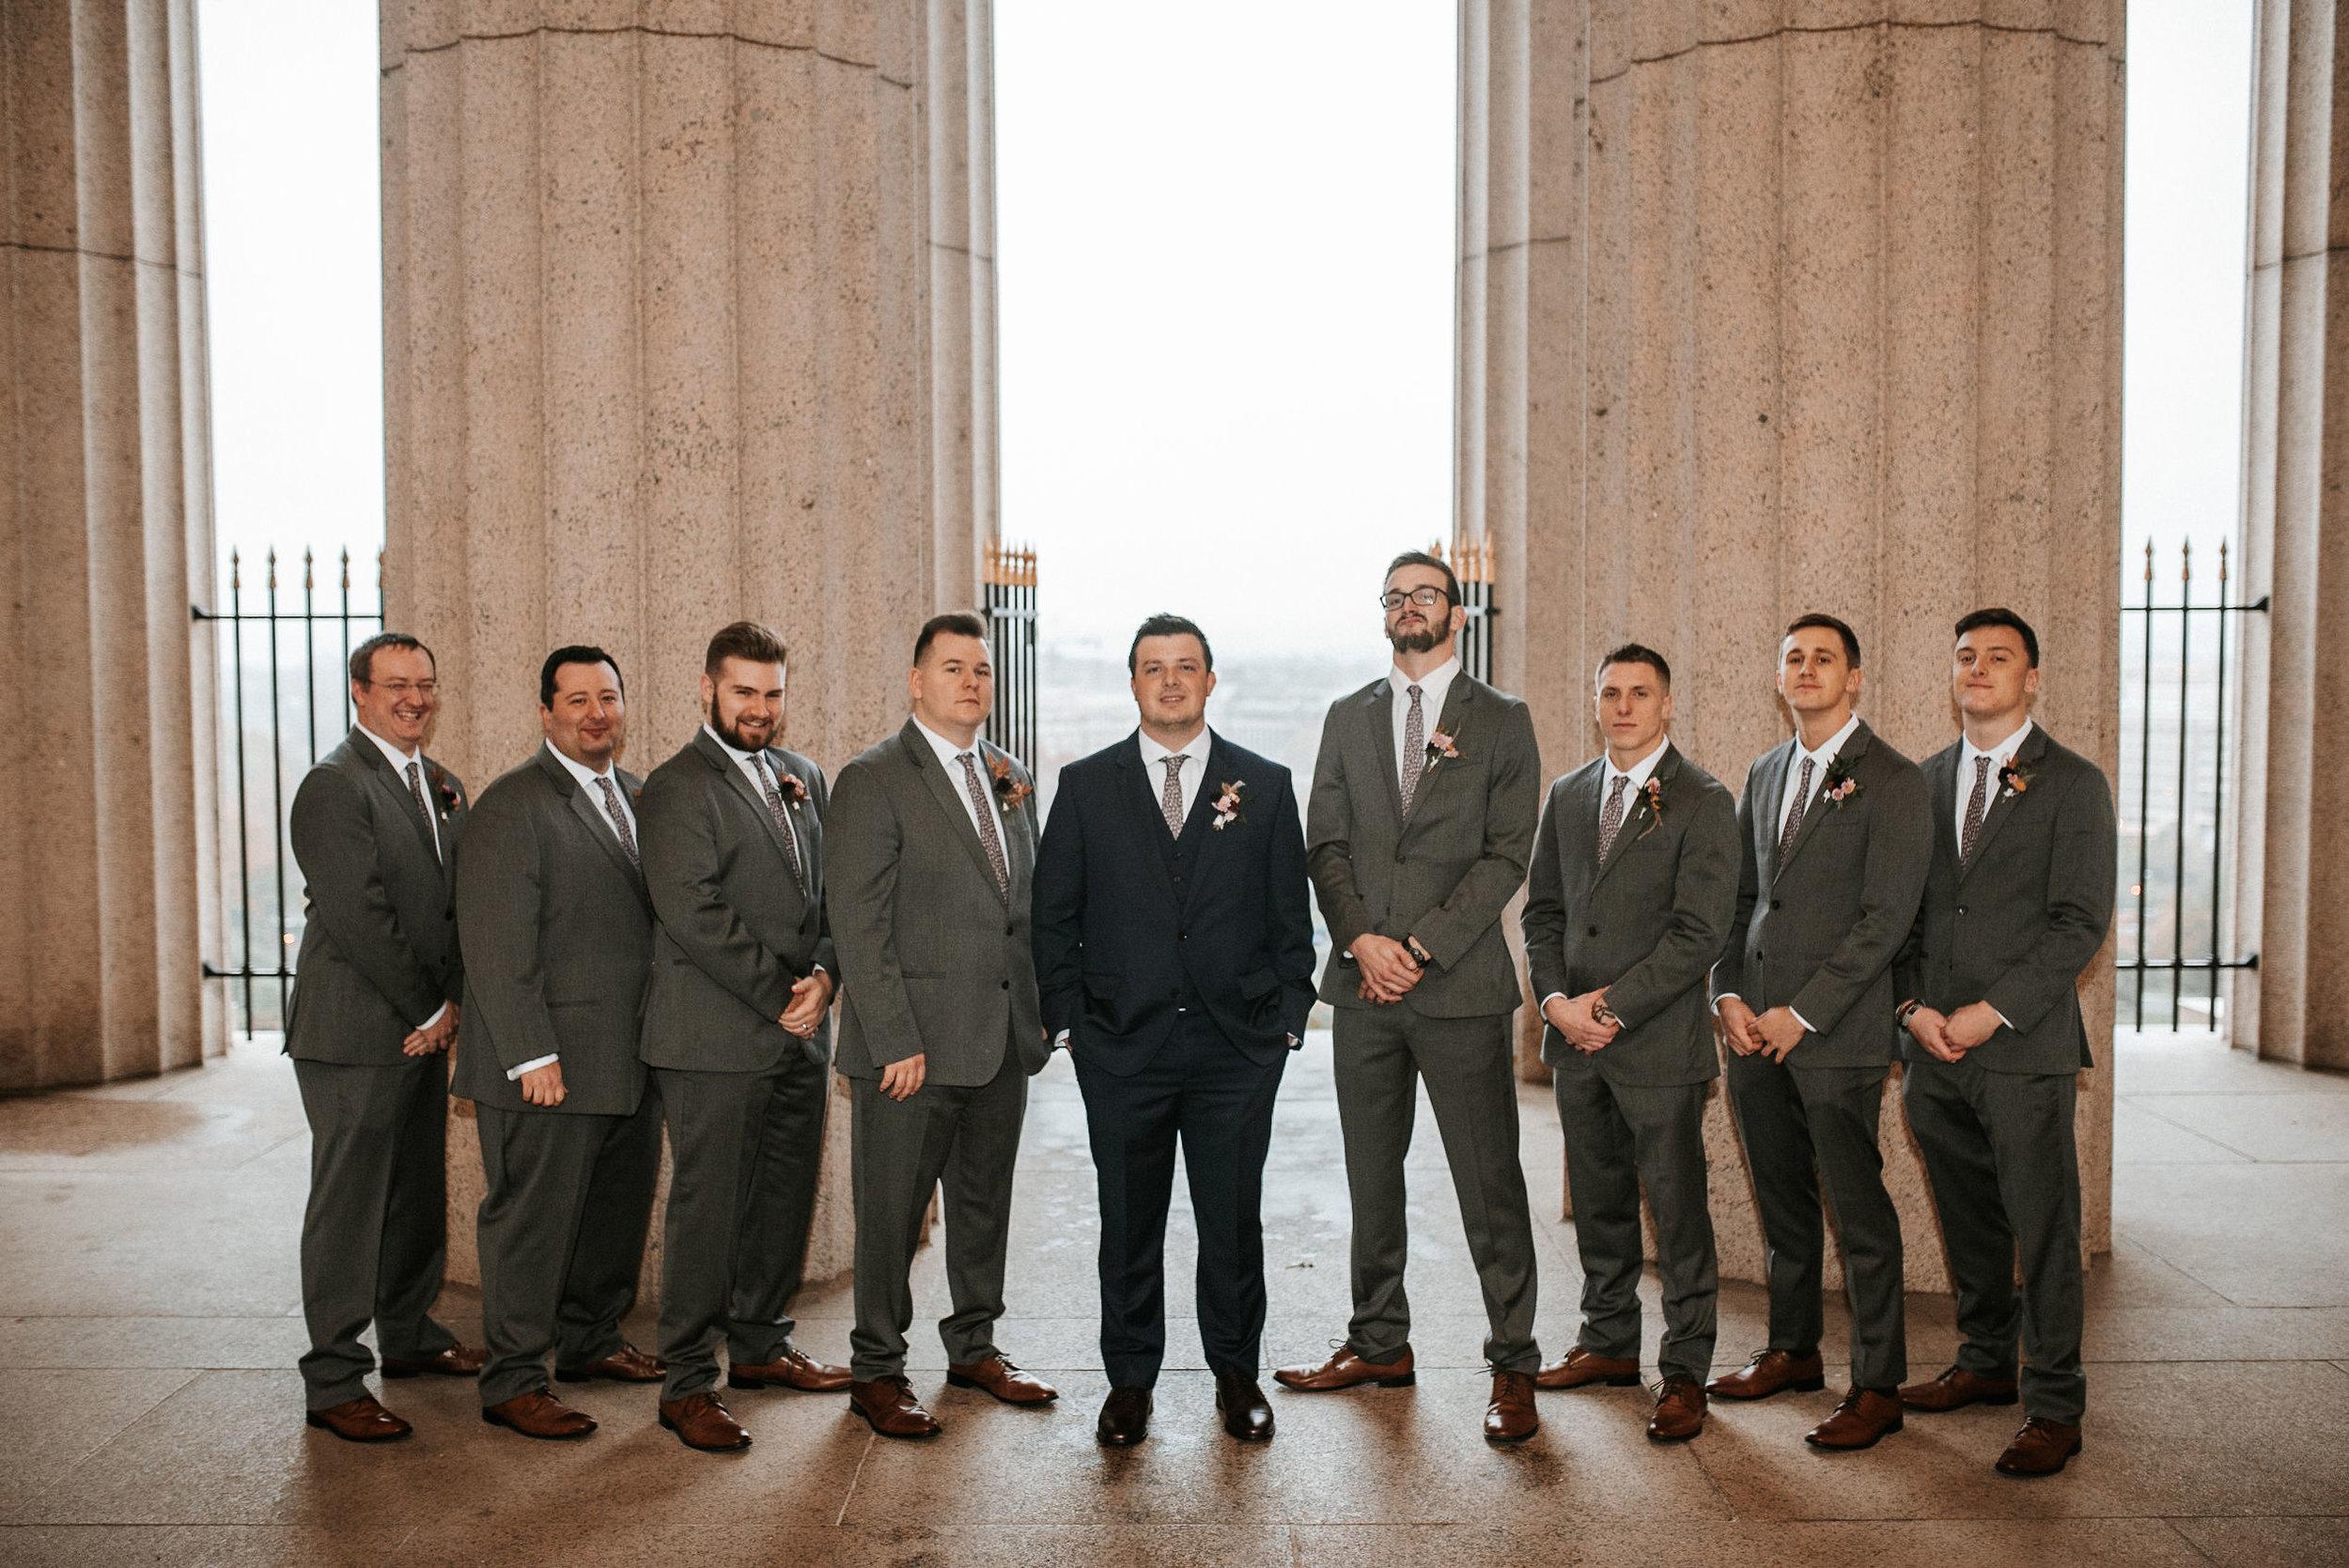 groomsmen posing at The George Washington Masonic National Memorial